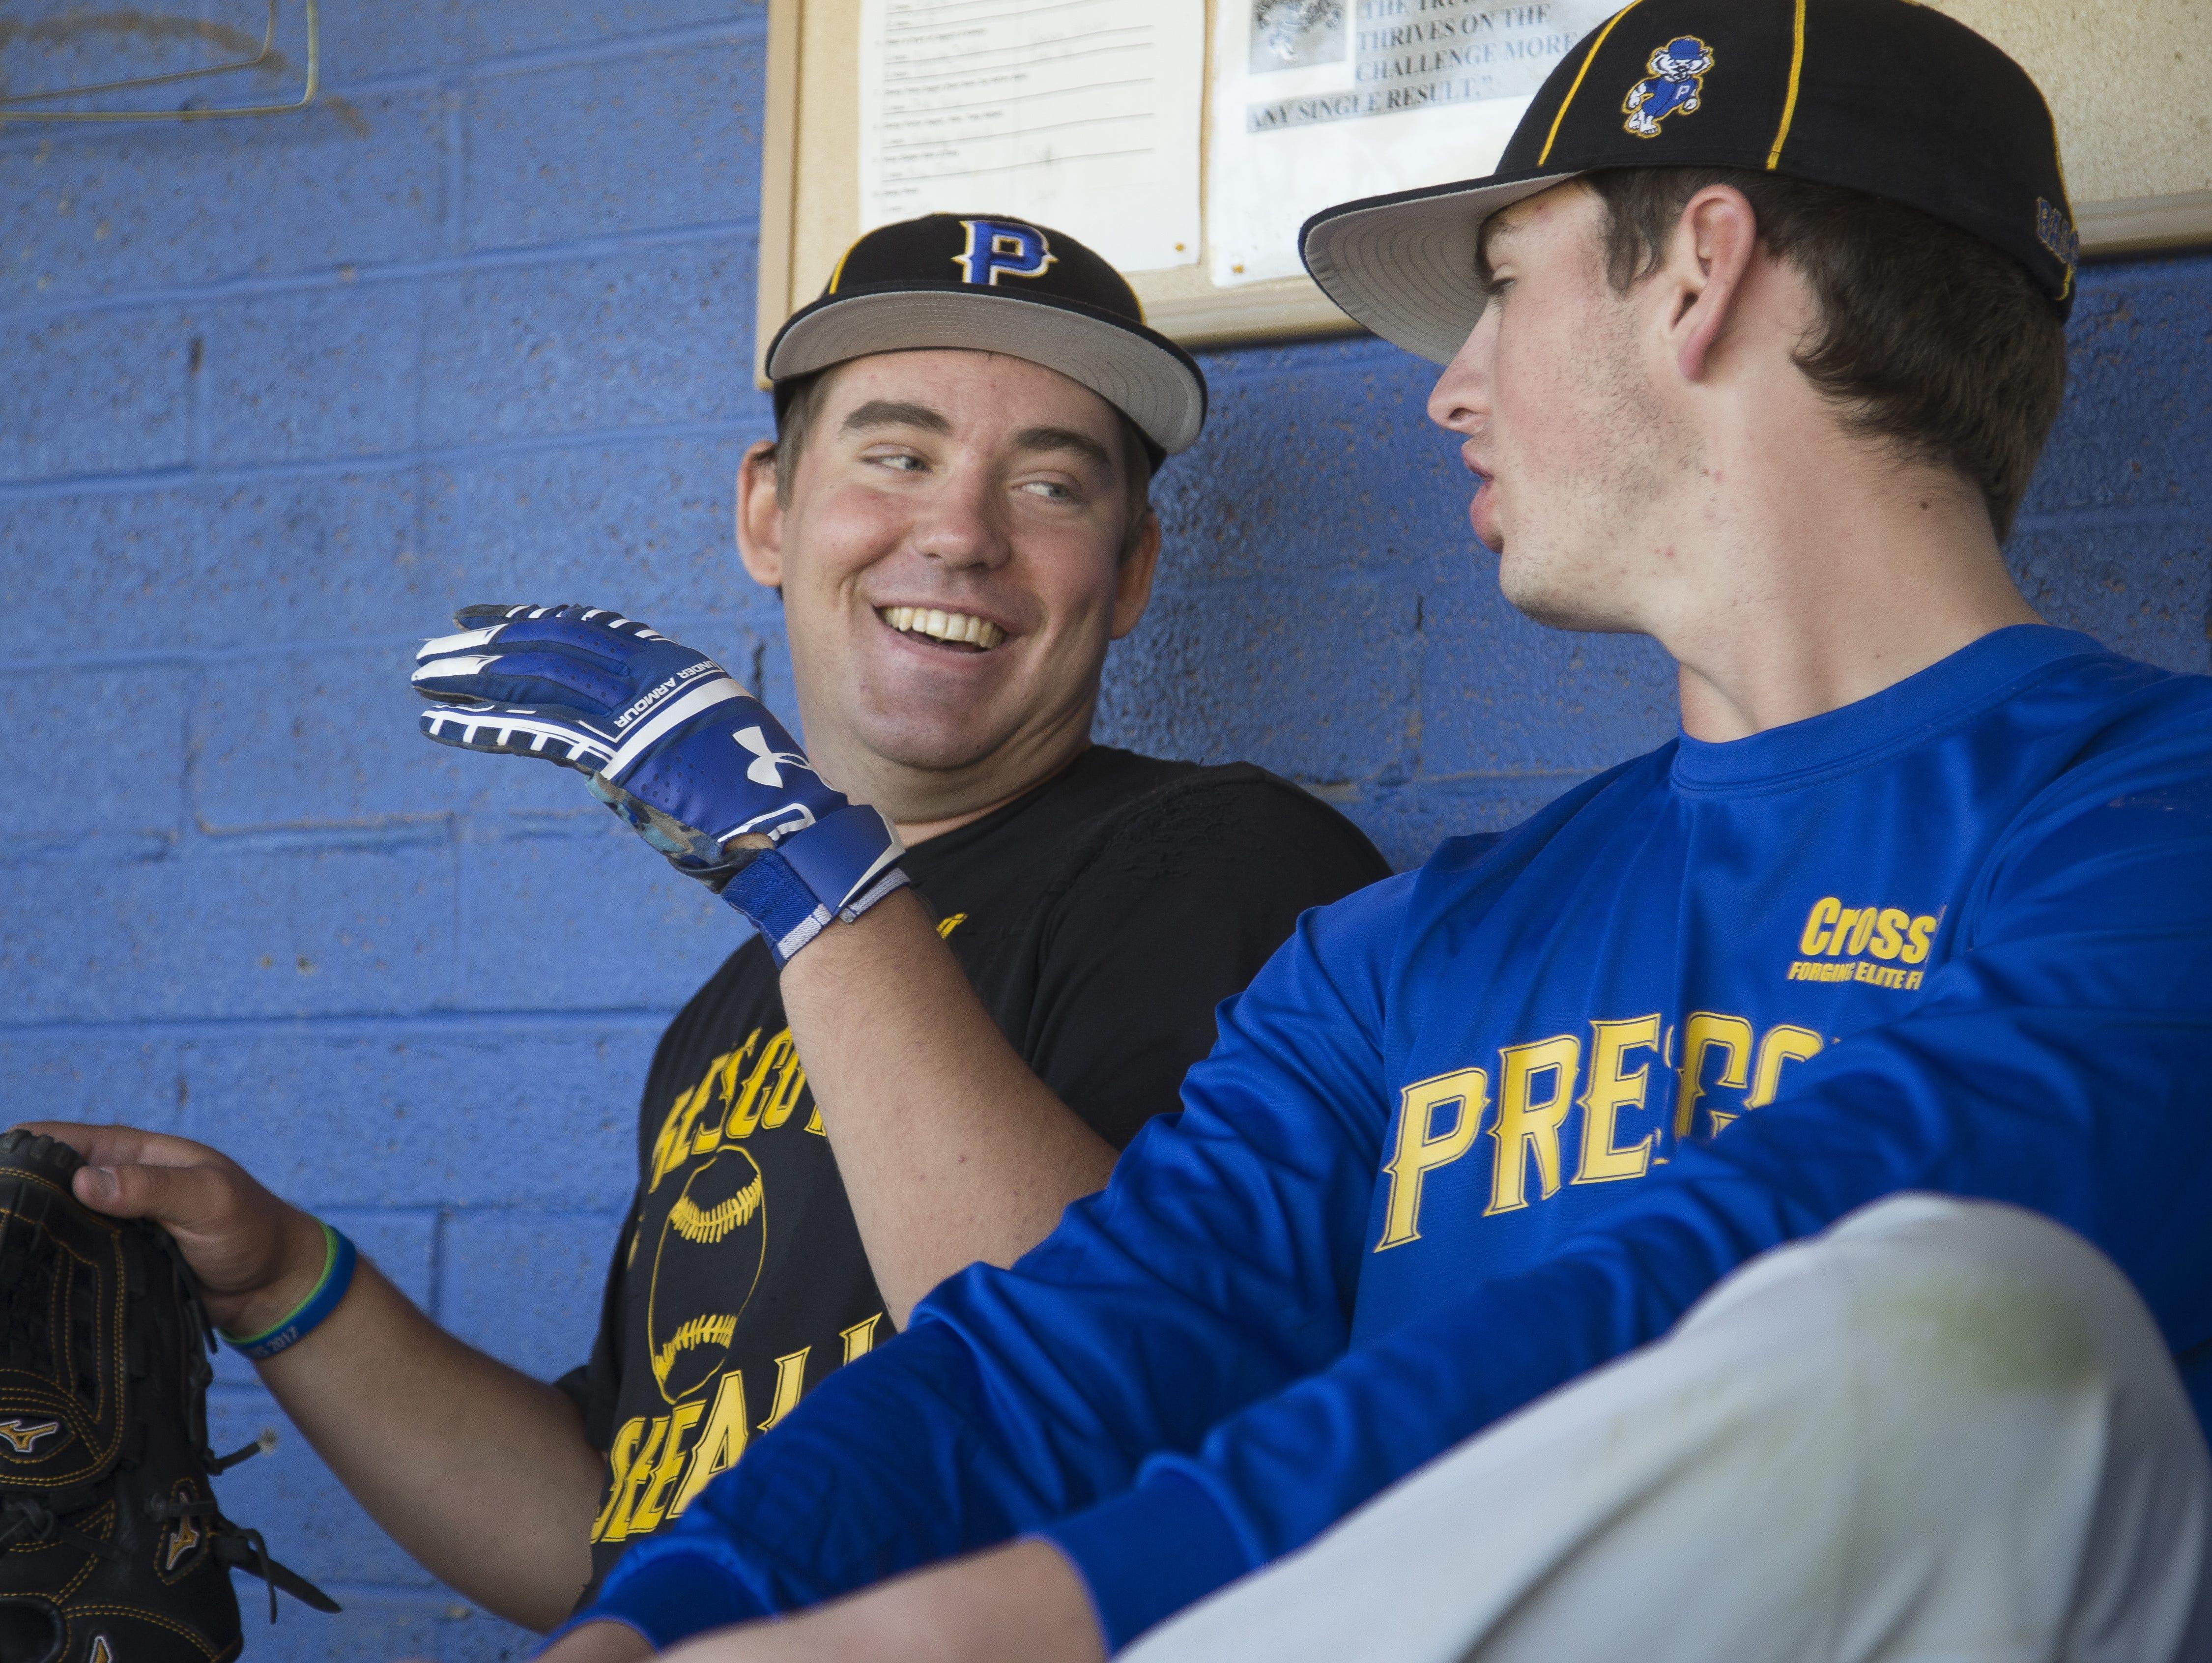 Prescott's Logan Carmick (in black) jokes with teammate Griffin Hays (R) before a baseball practice at Prescott High School on March 24, 2017 in Prescott, Ariz.